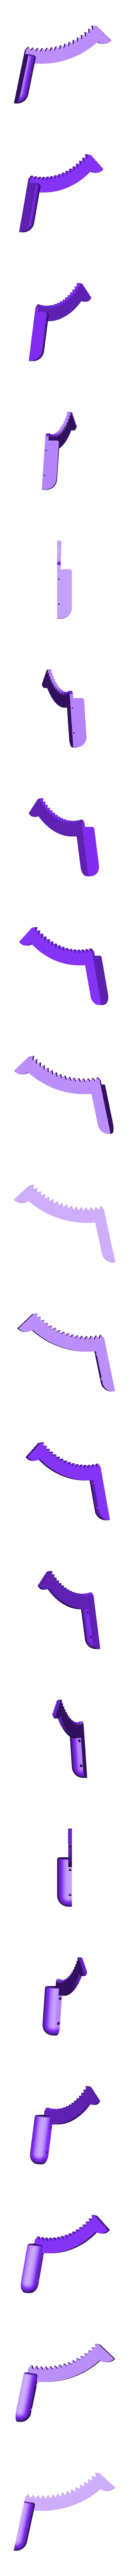 Spirograph _ Prusament Spool_by Dominik Cisar_001.stl Download free STL file SPIROGRAPH - PRUSAMENT SPOOL - reuse idea • 3D print model, cisardom